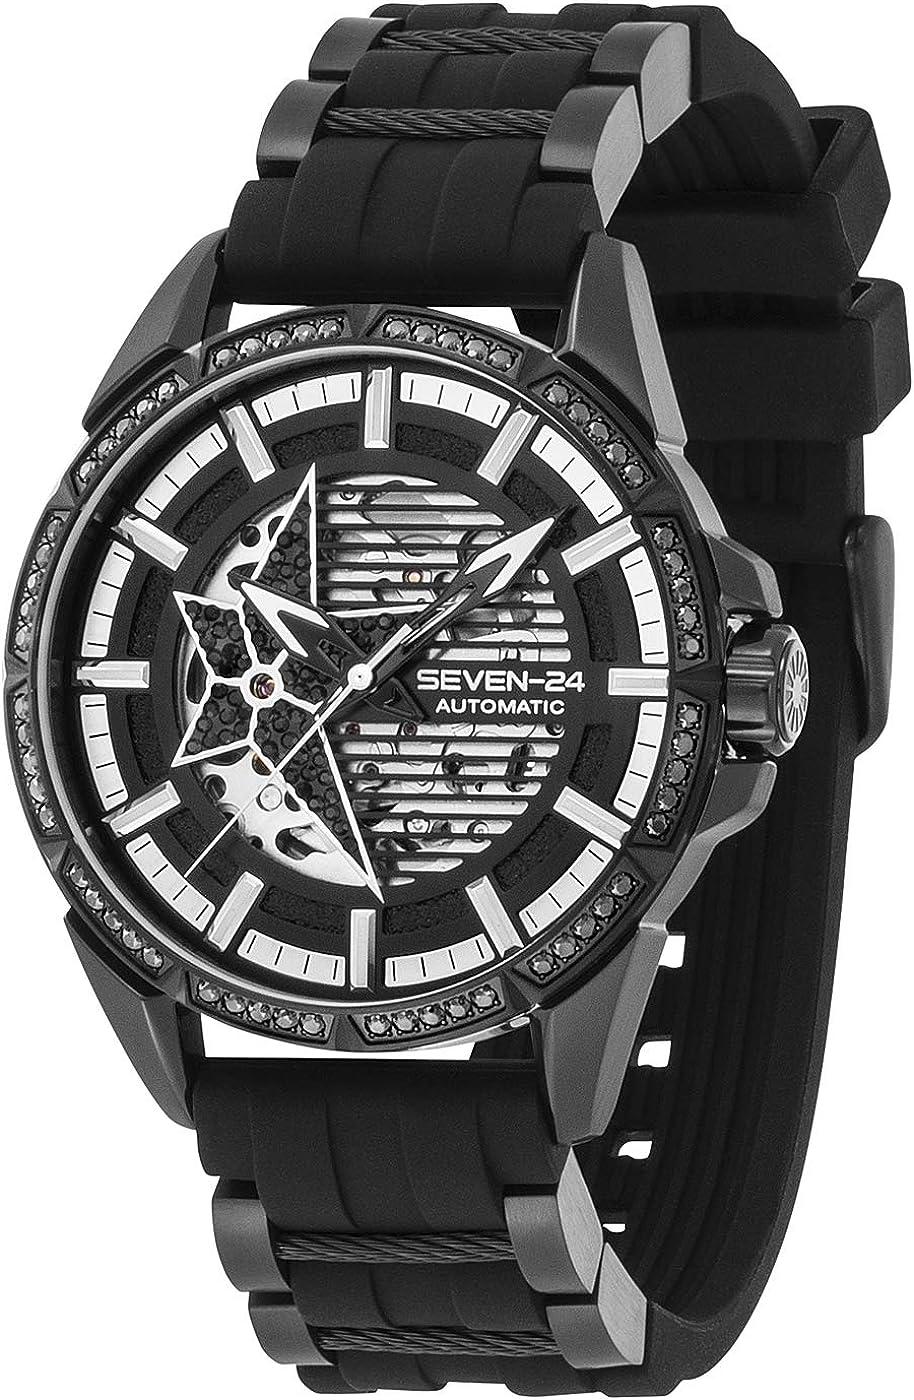 Seven-24 SV1259BSB-06ST Star - Reloj de pulsera automático para hombre